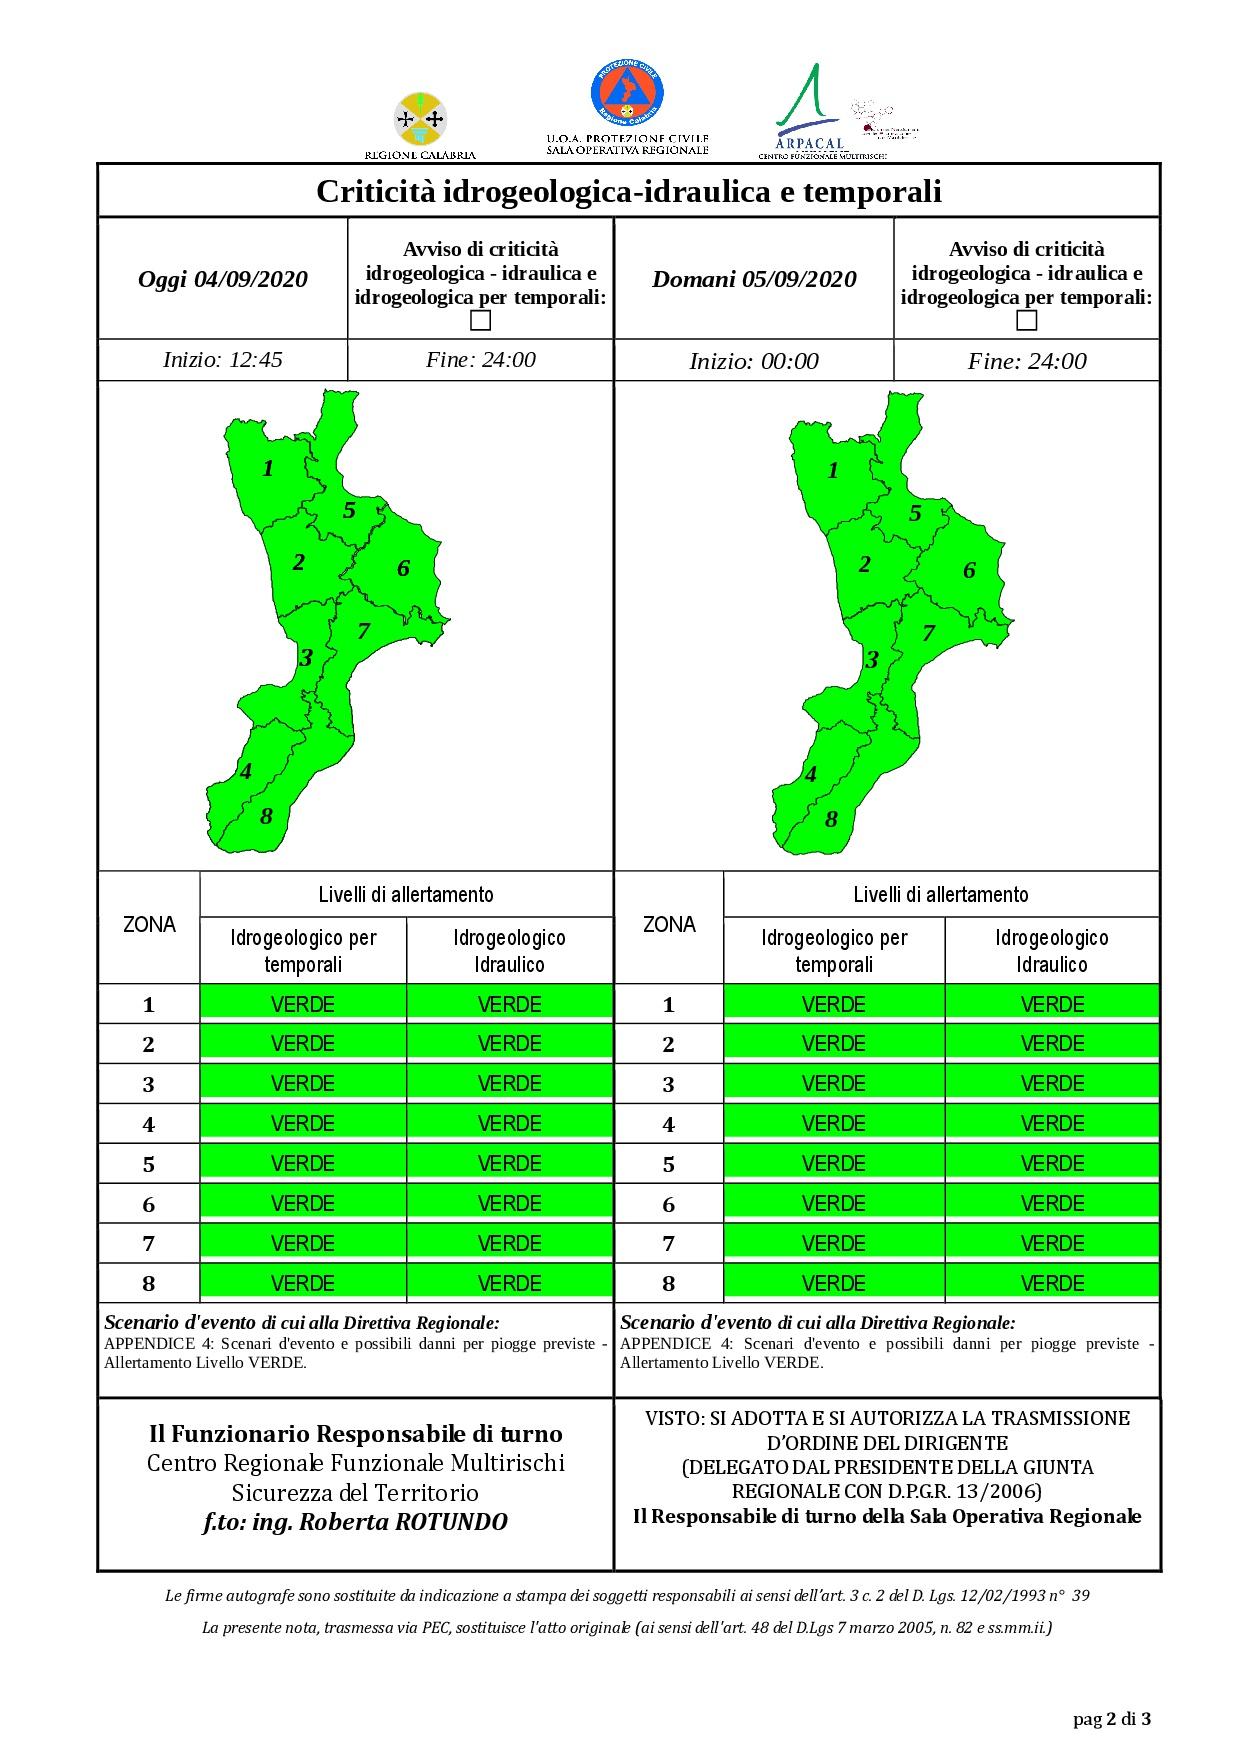 Criticità idrogeologica-idraulica e temporali in Calabria 04-09-2020